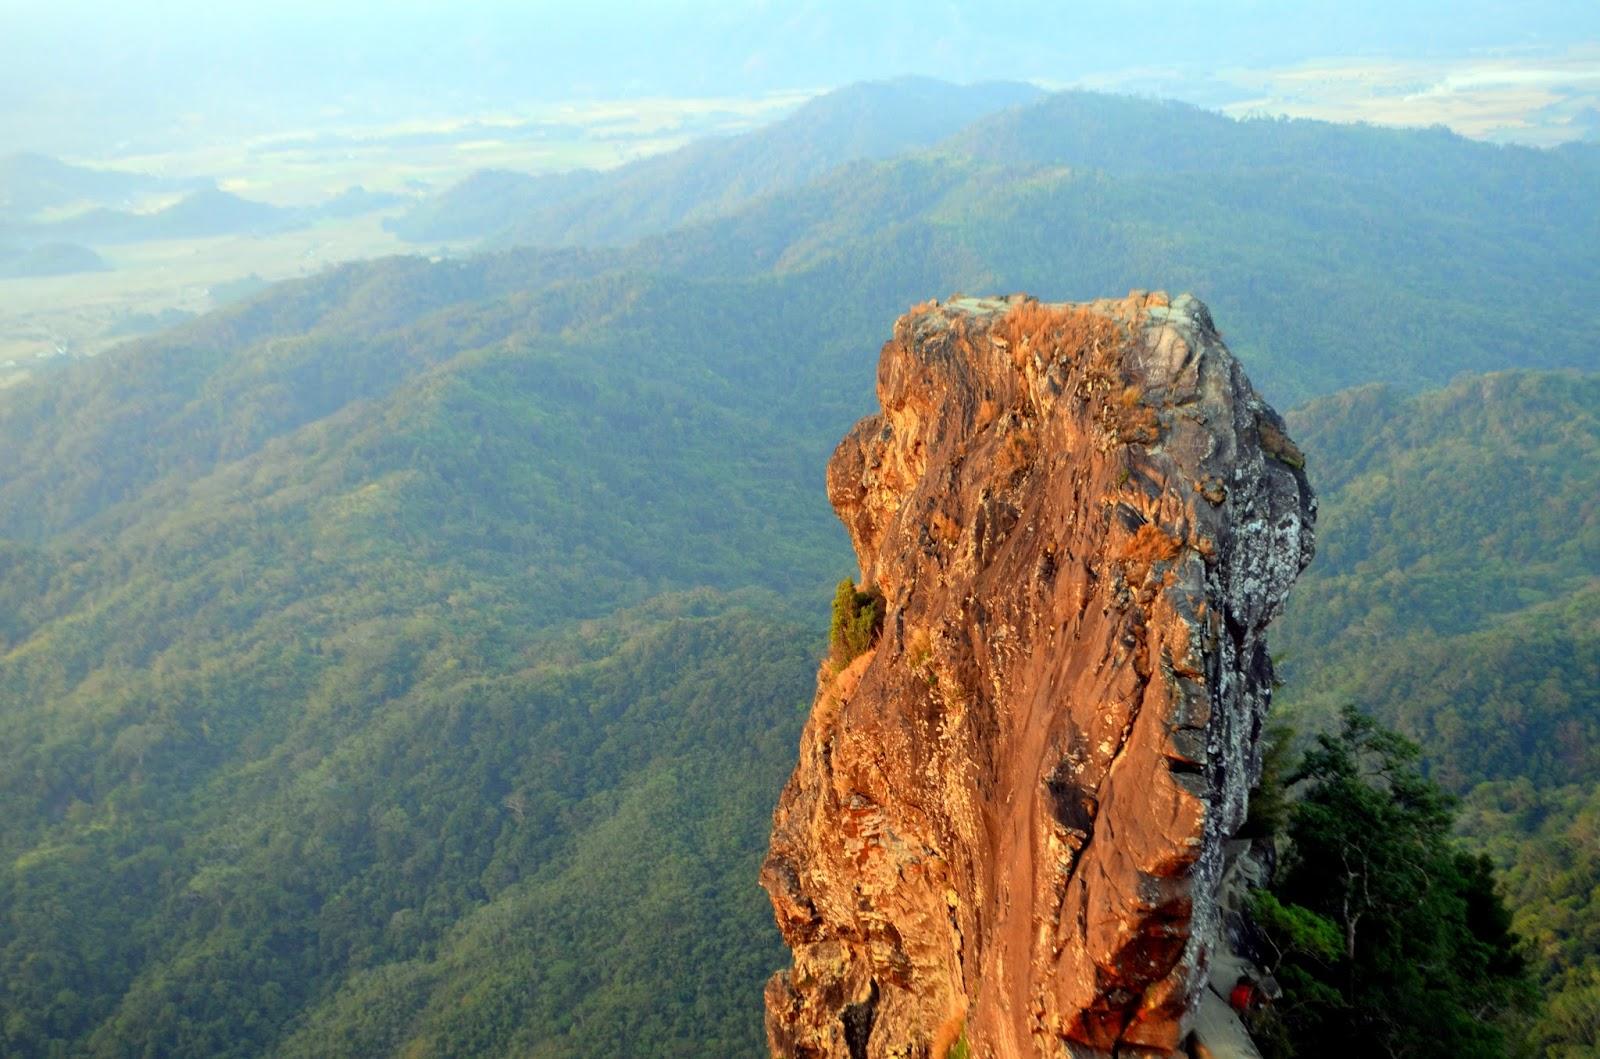 Monolith Pico De Loro